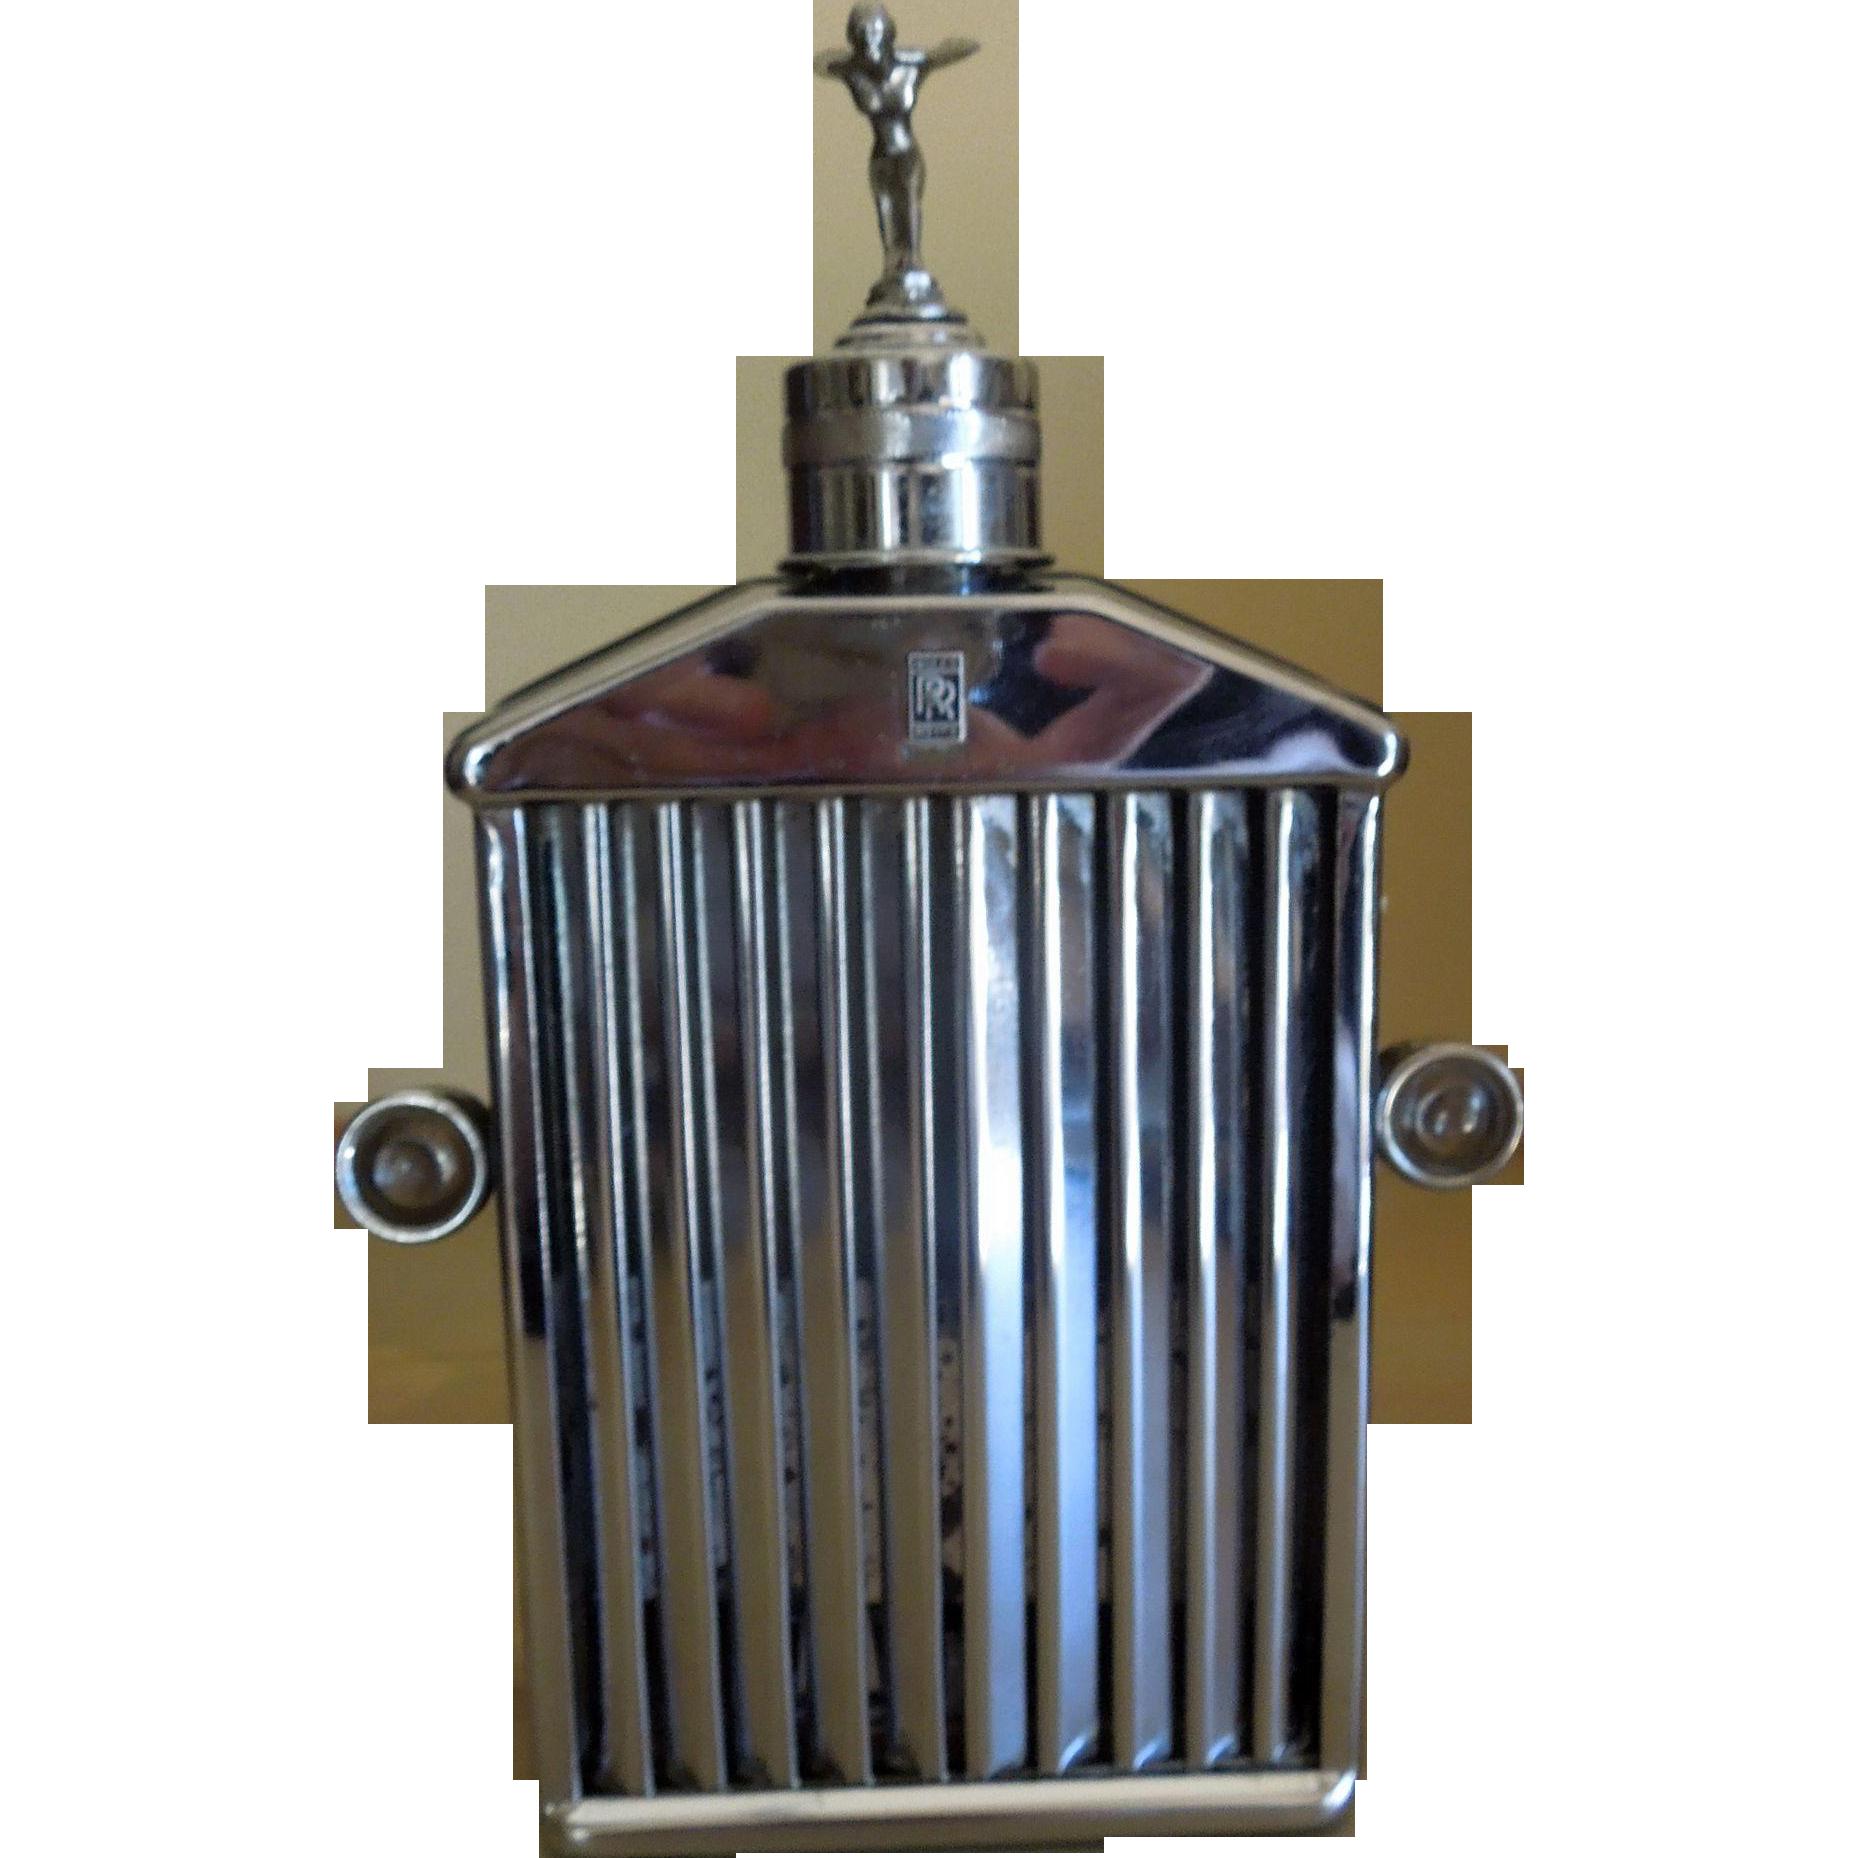 Vintage Rolls Royce Drinks Decanter Music Box